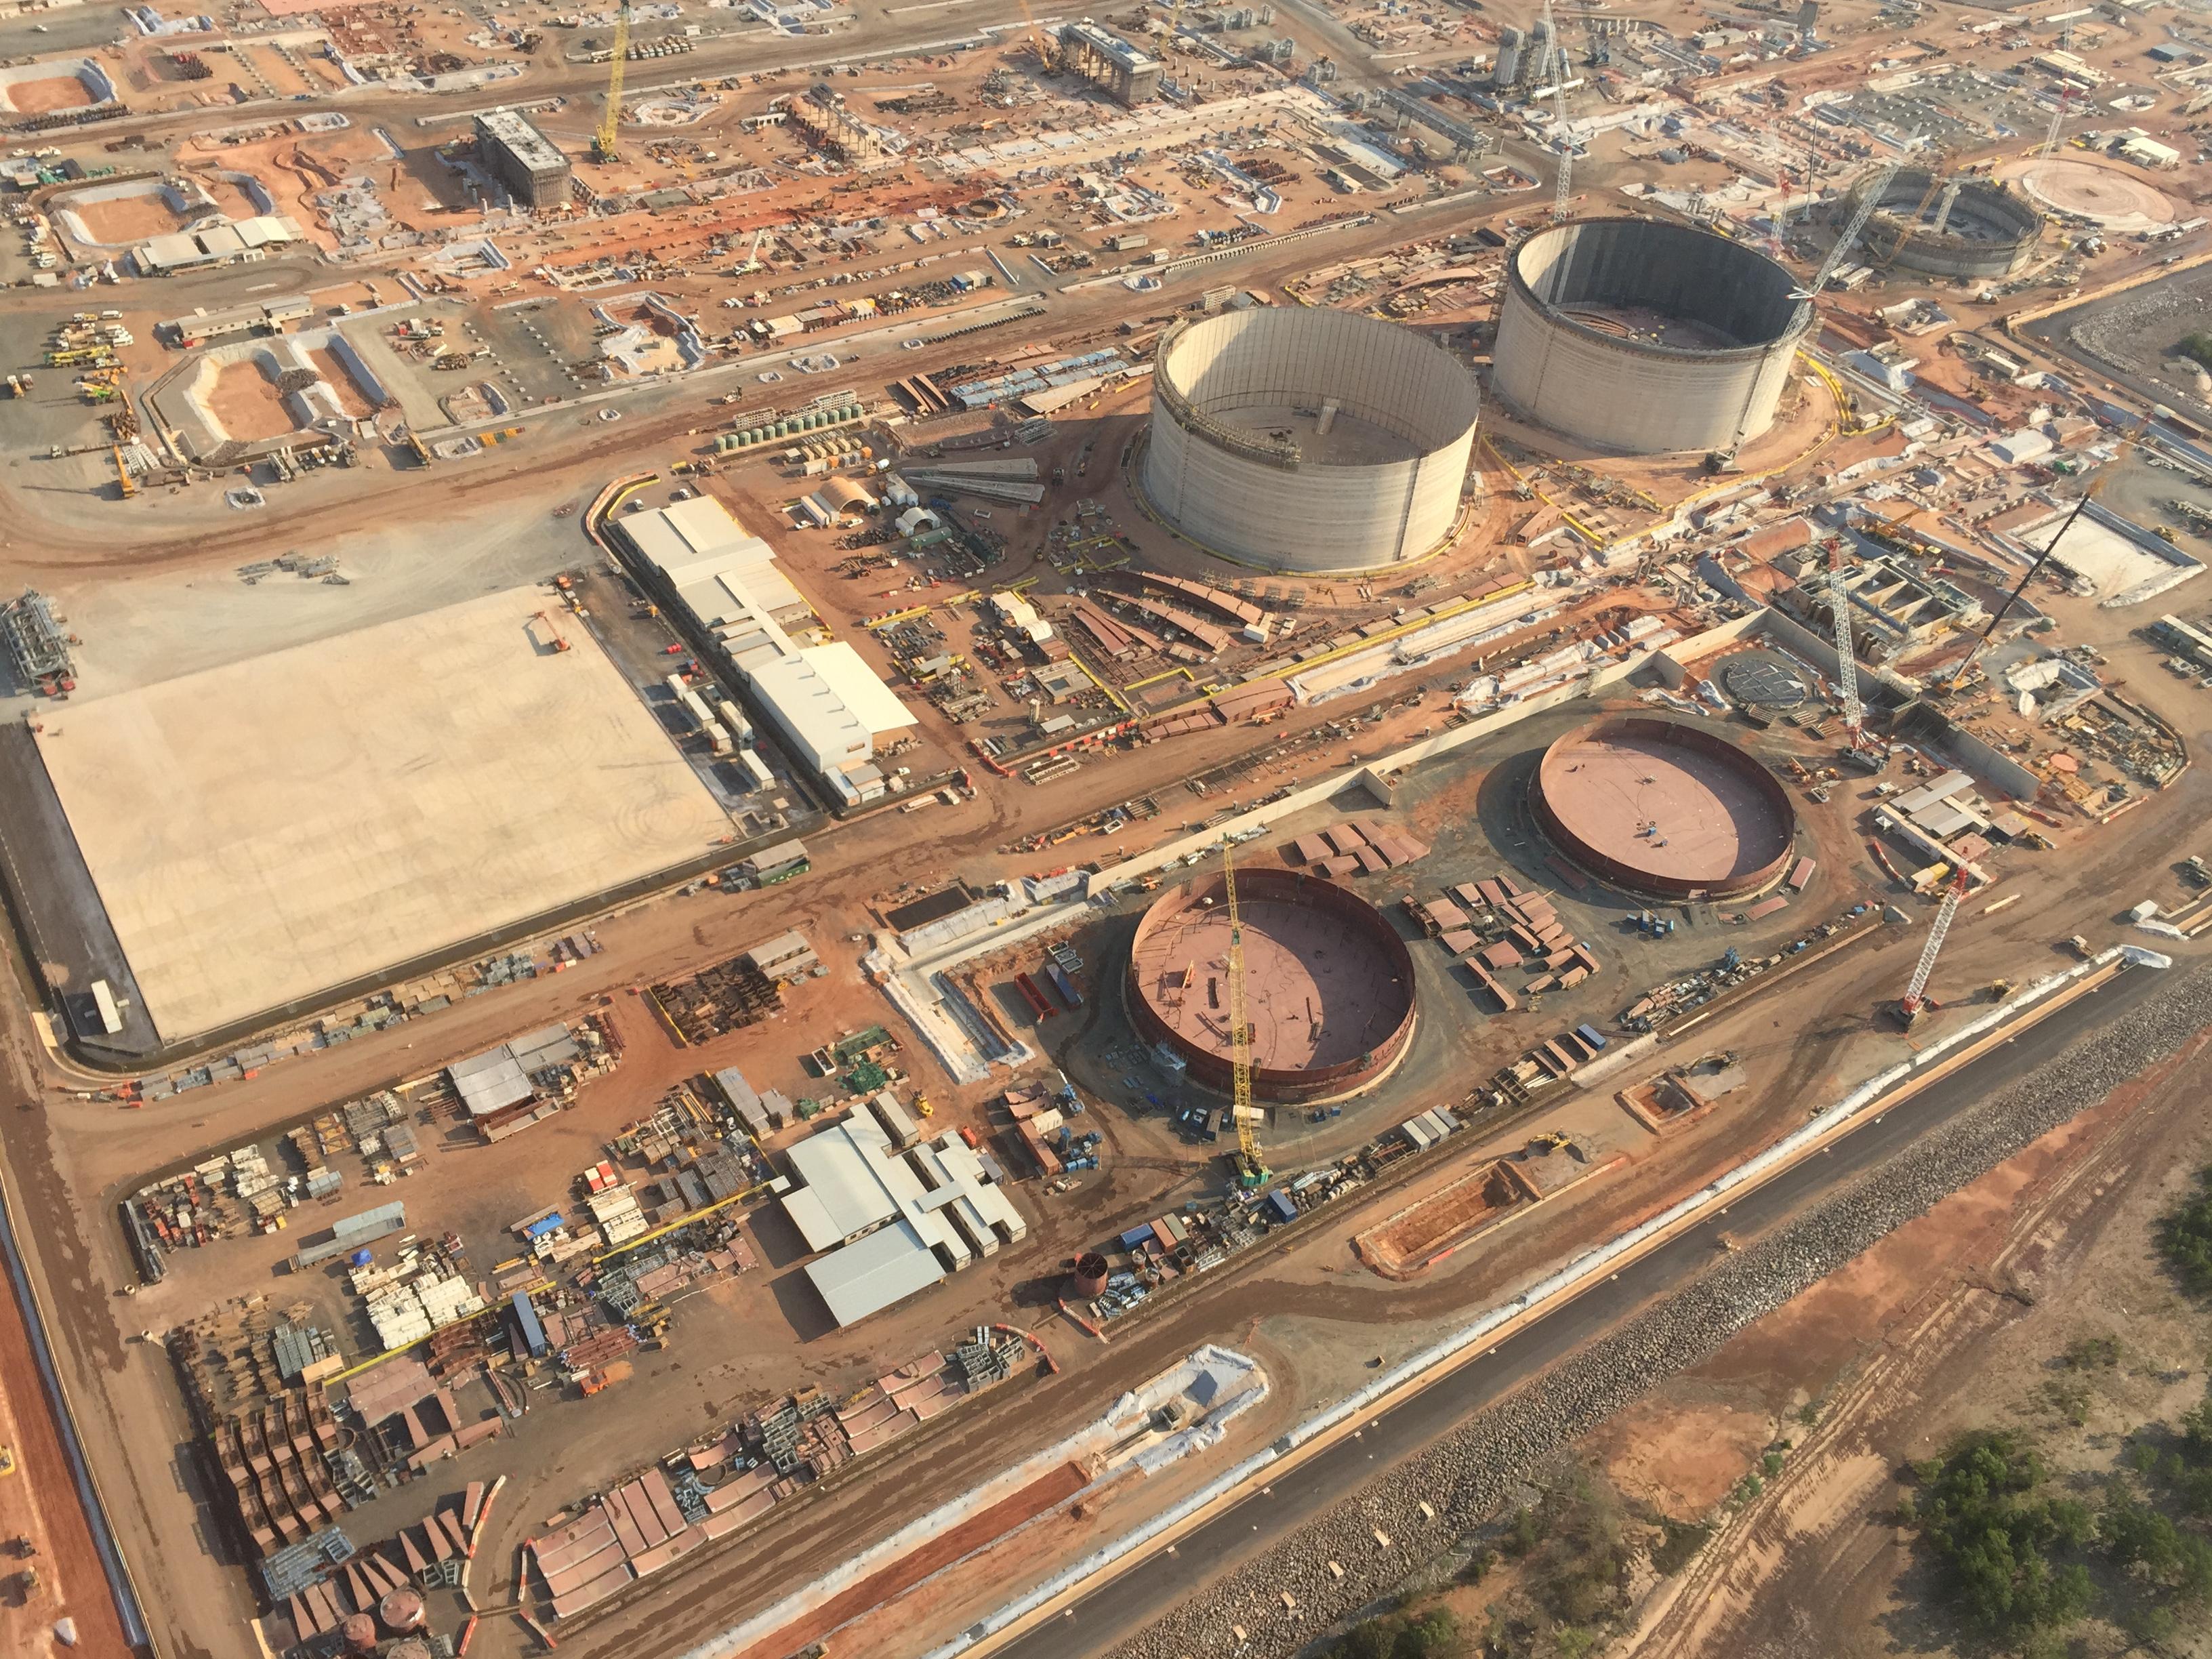 Liquid natural gas  tank under construction.